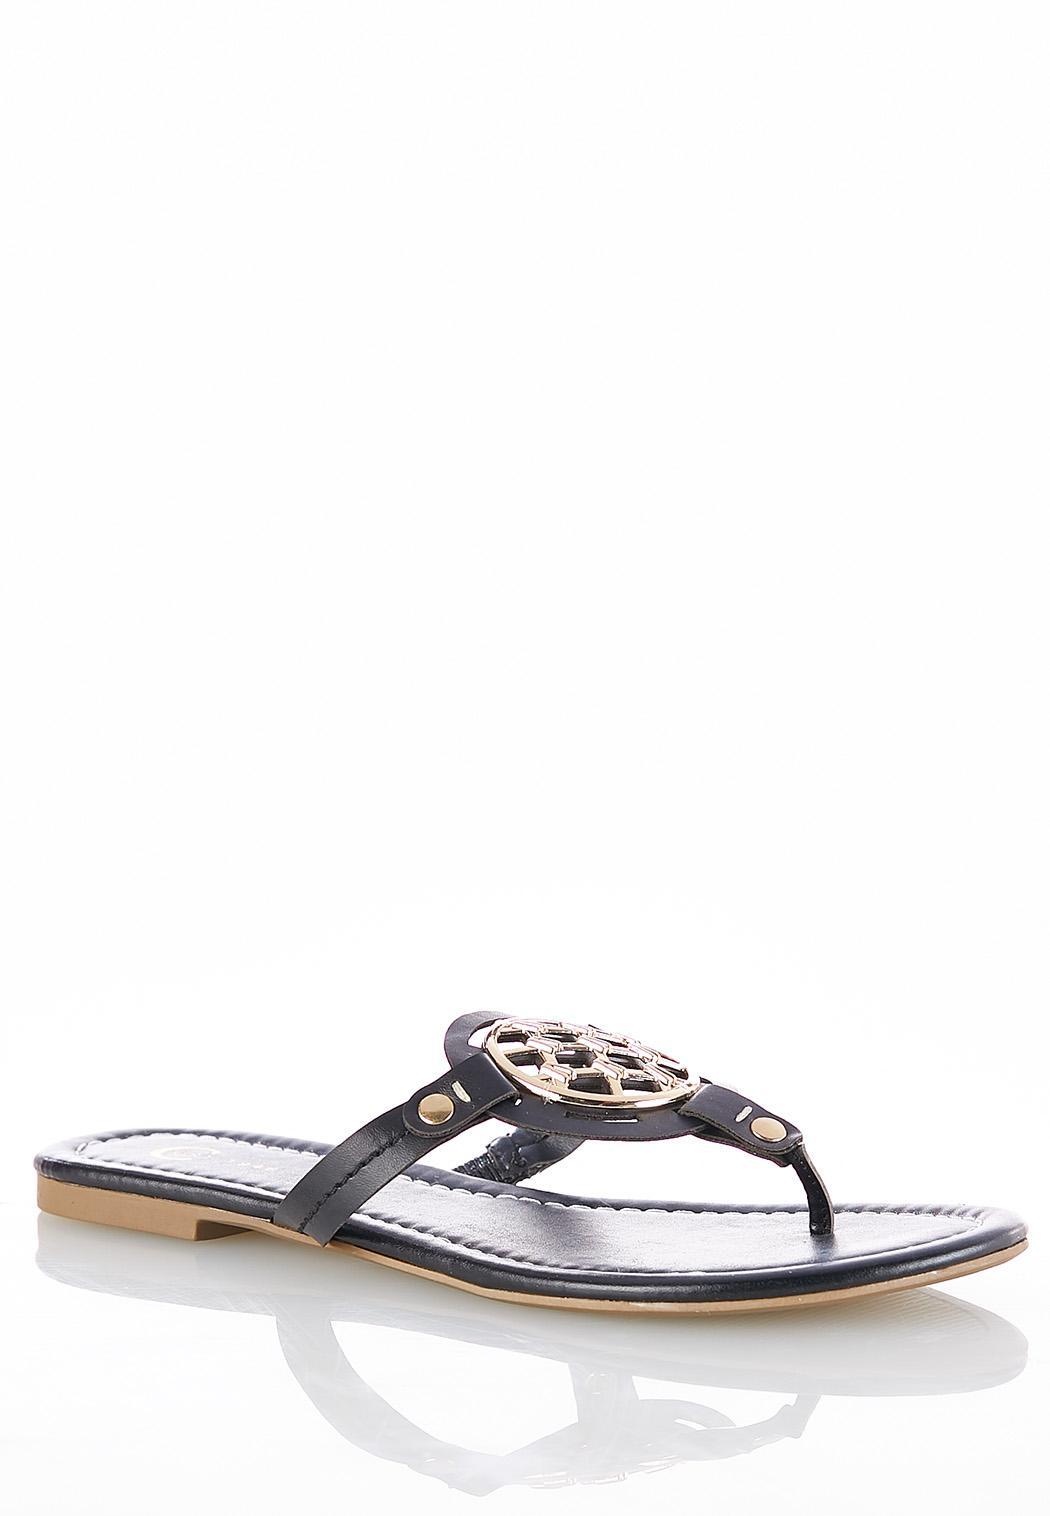 Medallion Thong Sandals